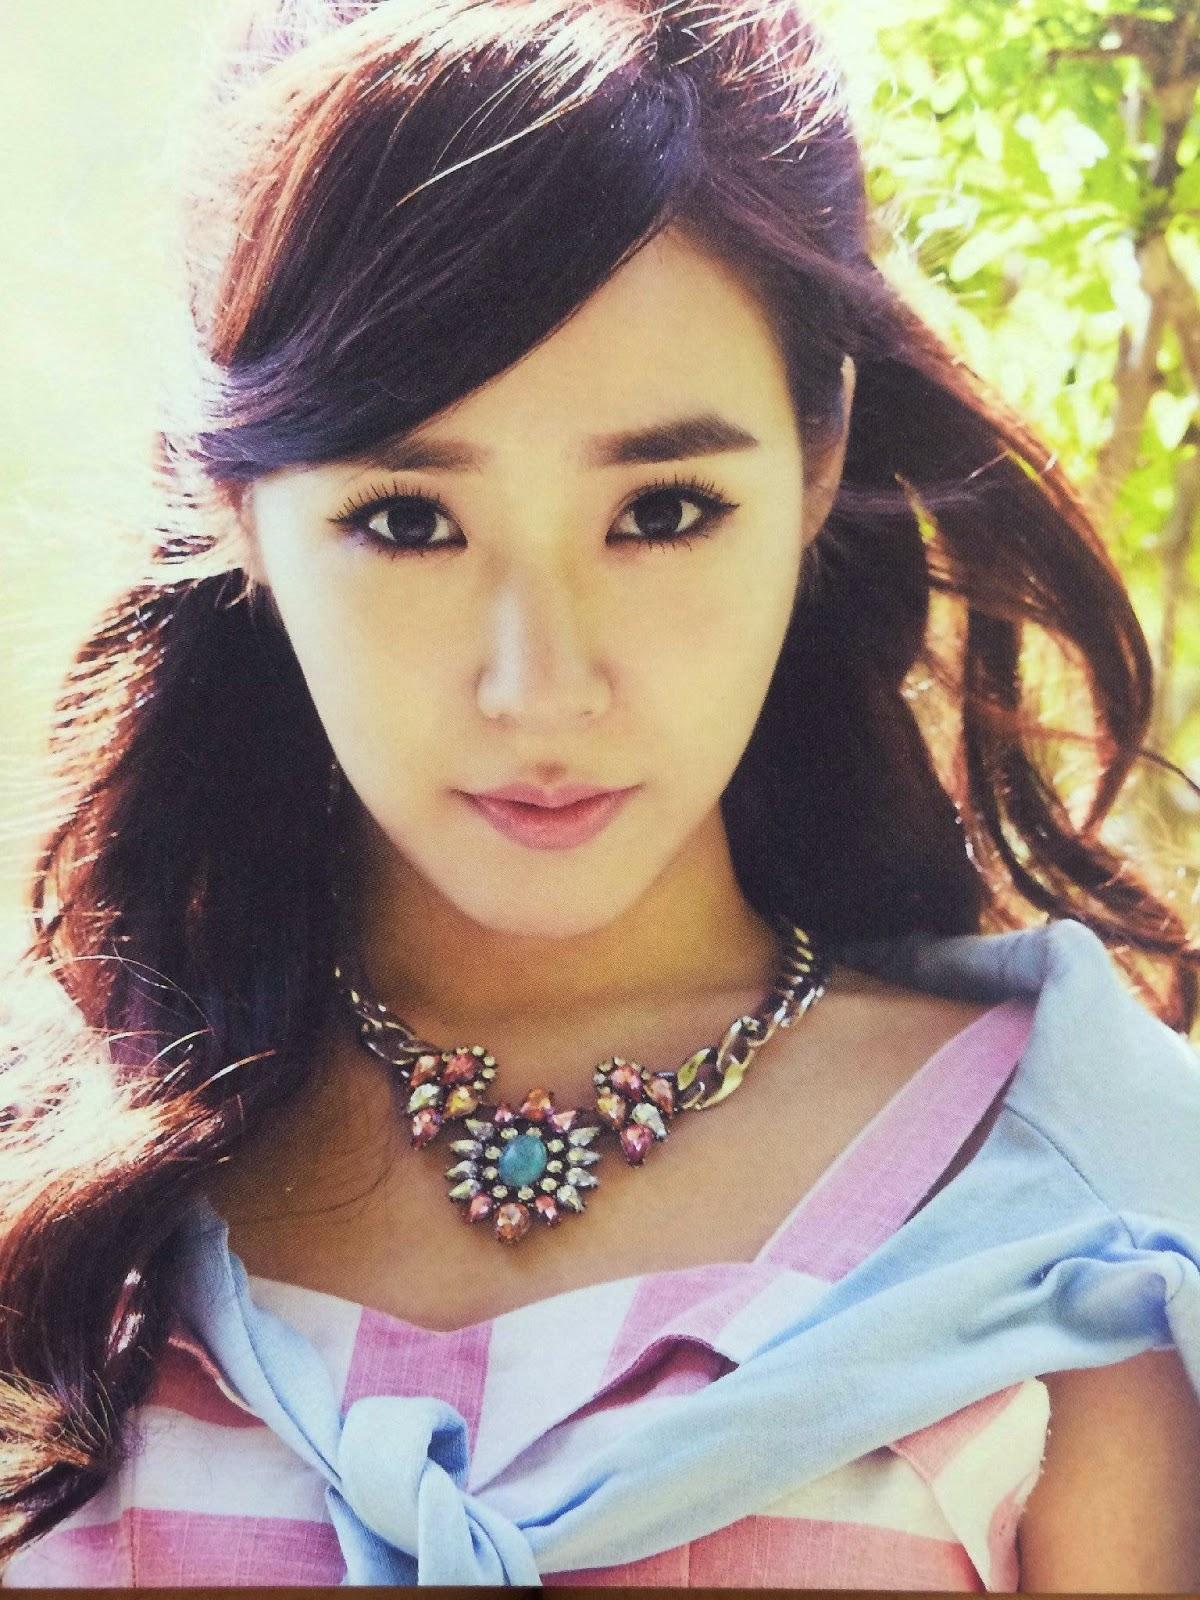 SNSD Tiffany (티파니; ティファニー) Girls Generation The Best Scan Photos 4